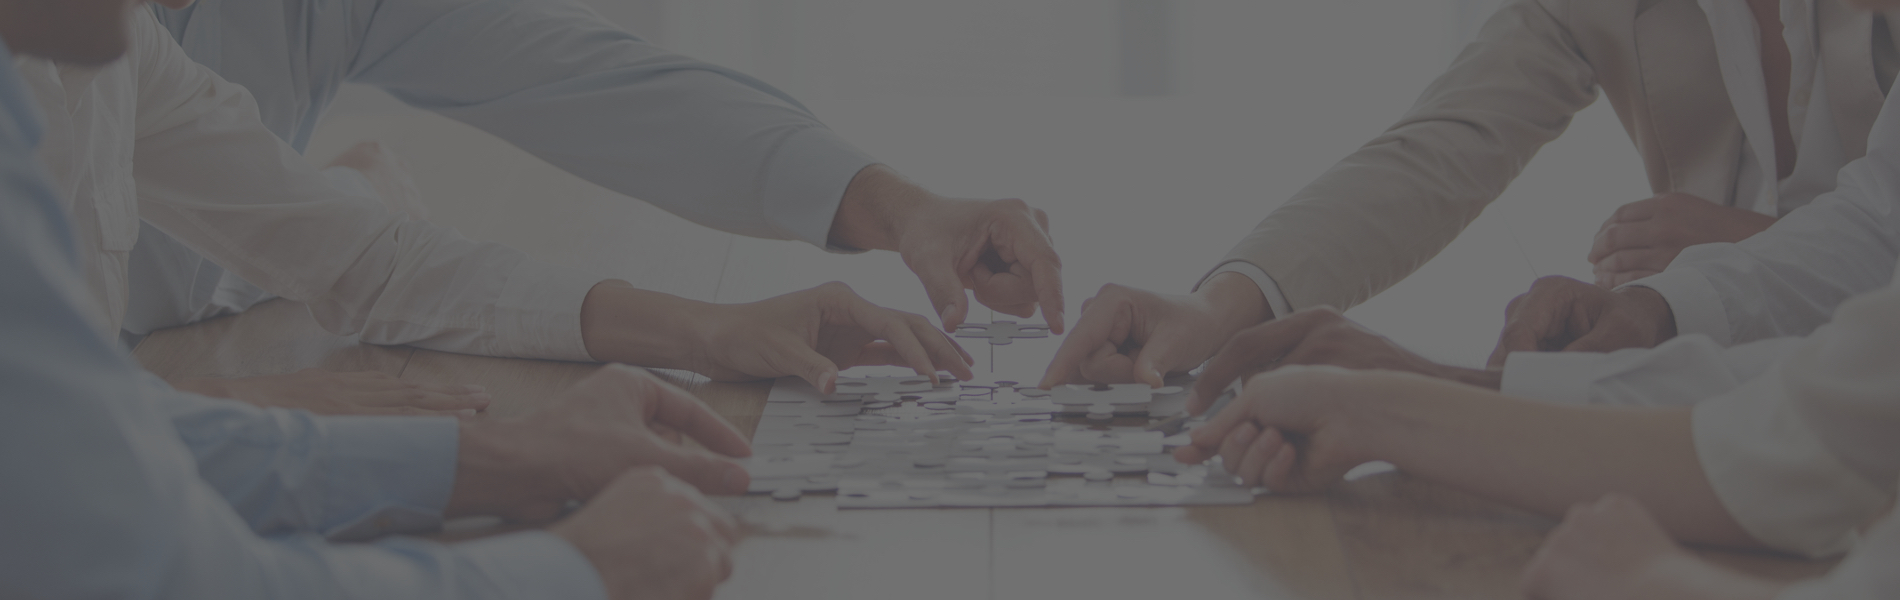 create employee culture